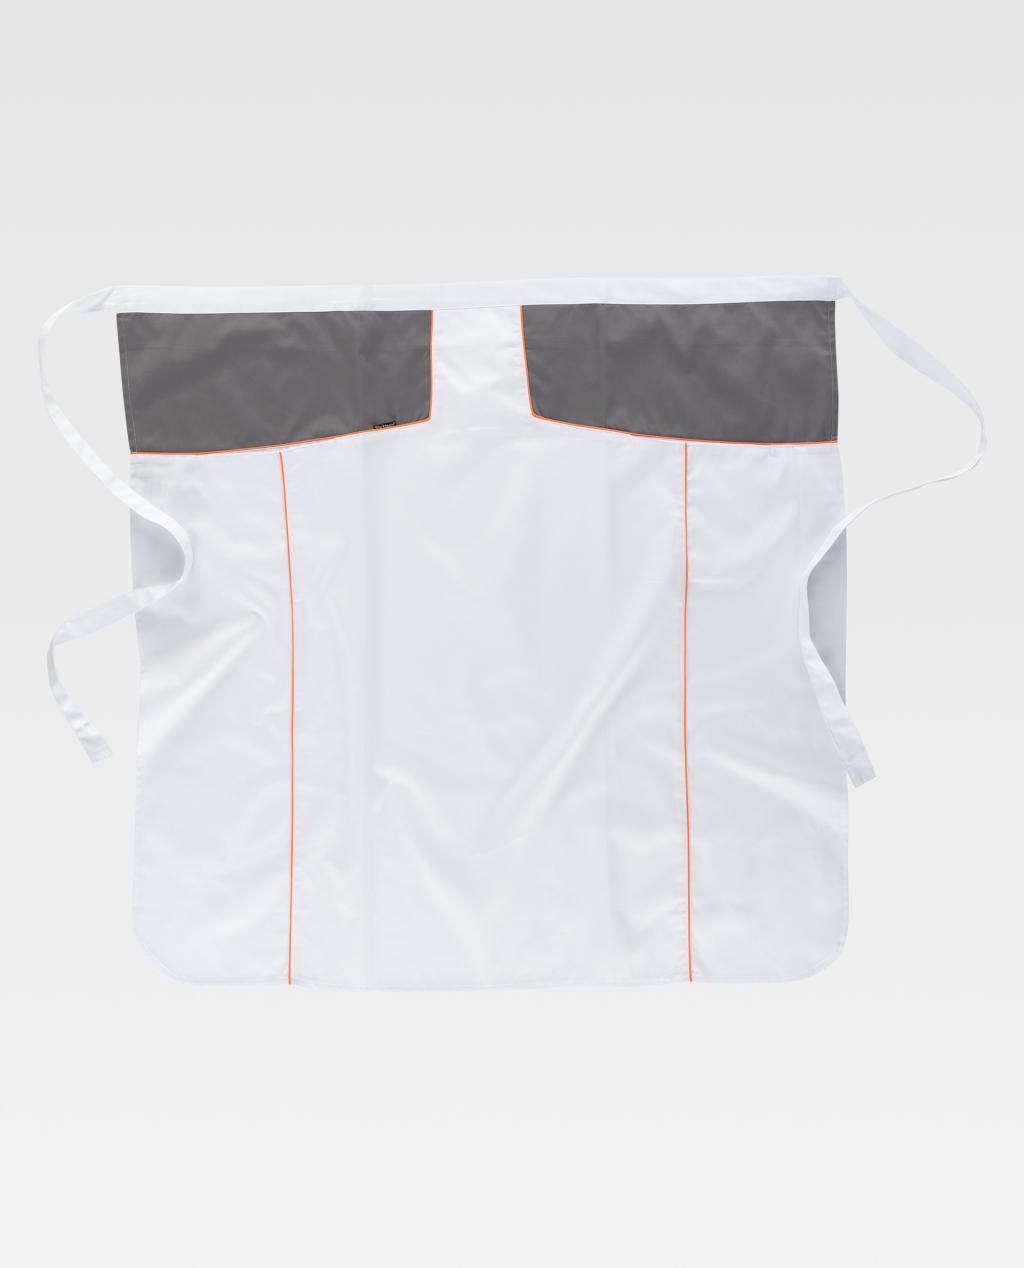 Avental de Cintura W/T